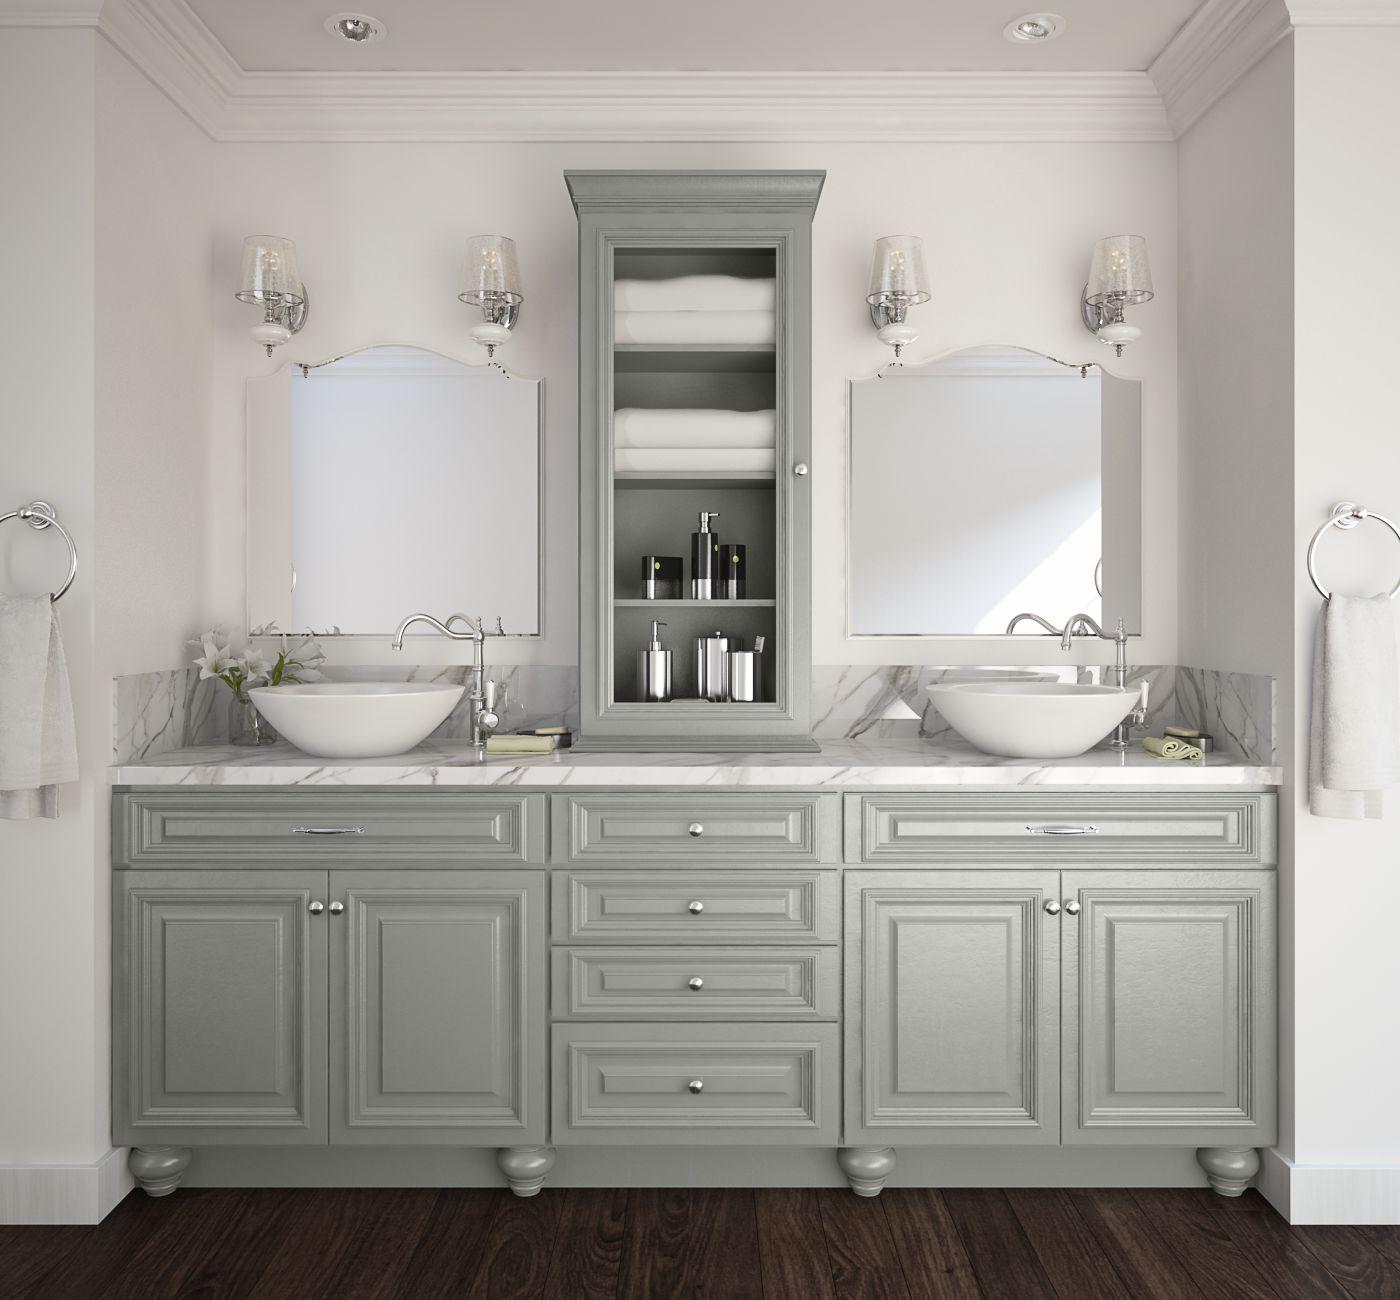 Already Assembled Kitchen Cabinets: Roosevelt Steel Gray Pre-Assembled Kitchen Cabinets